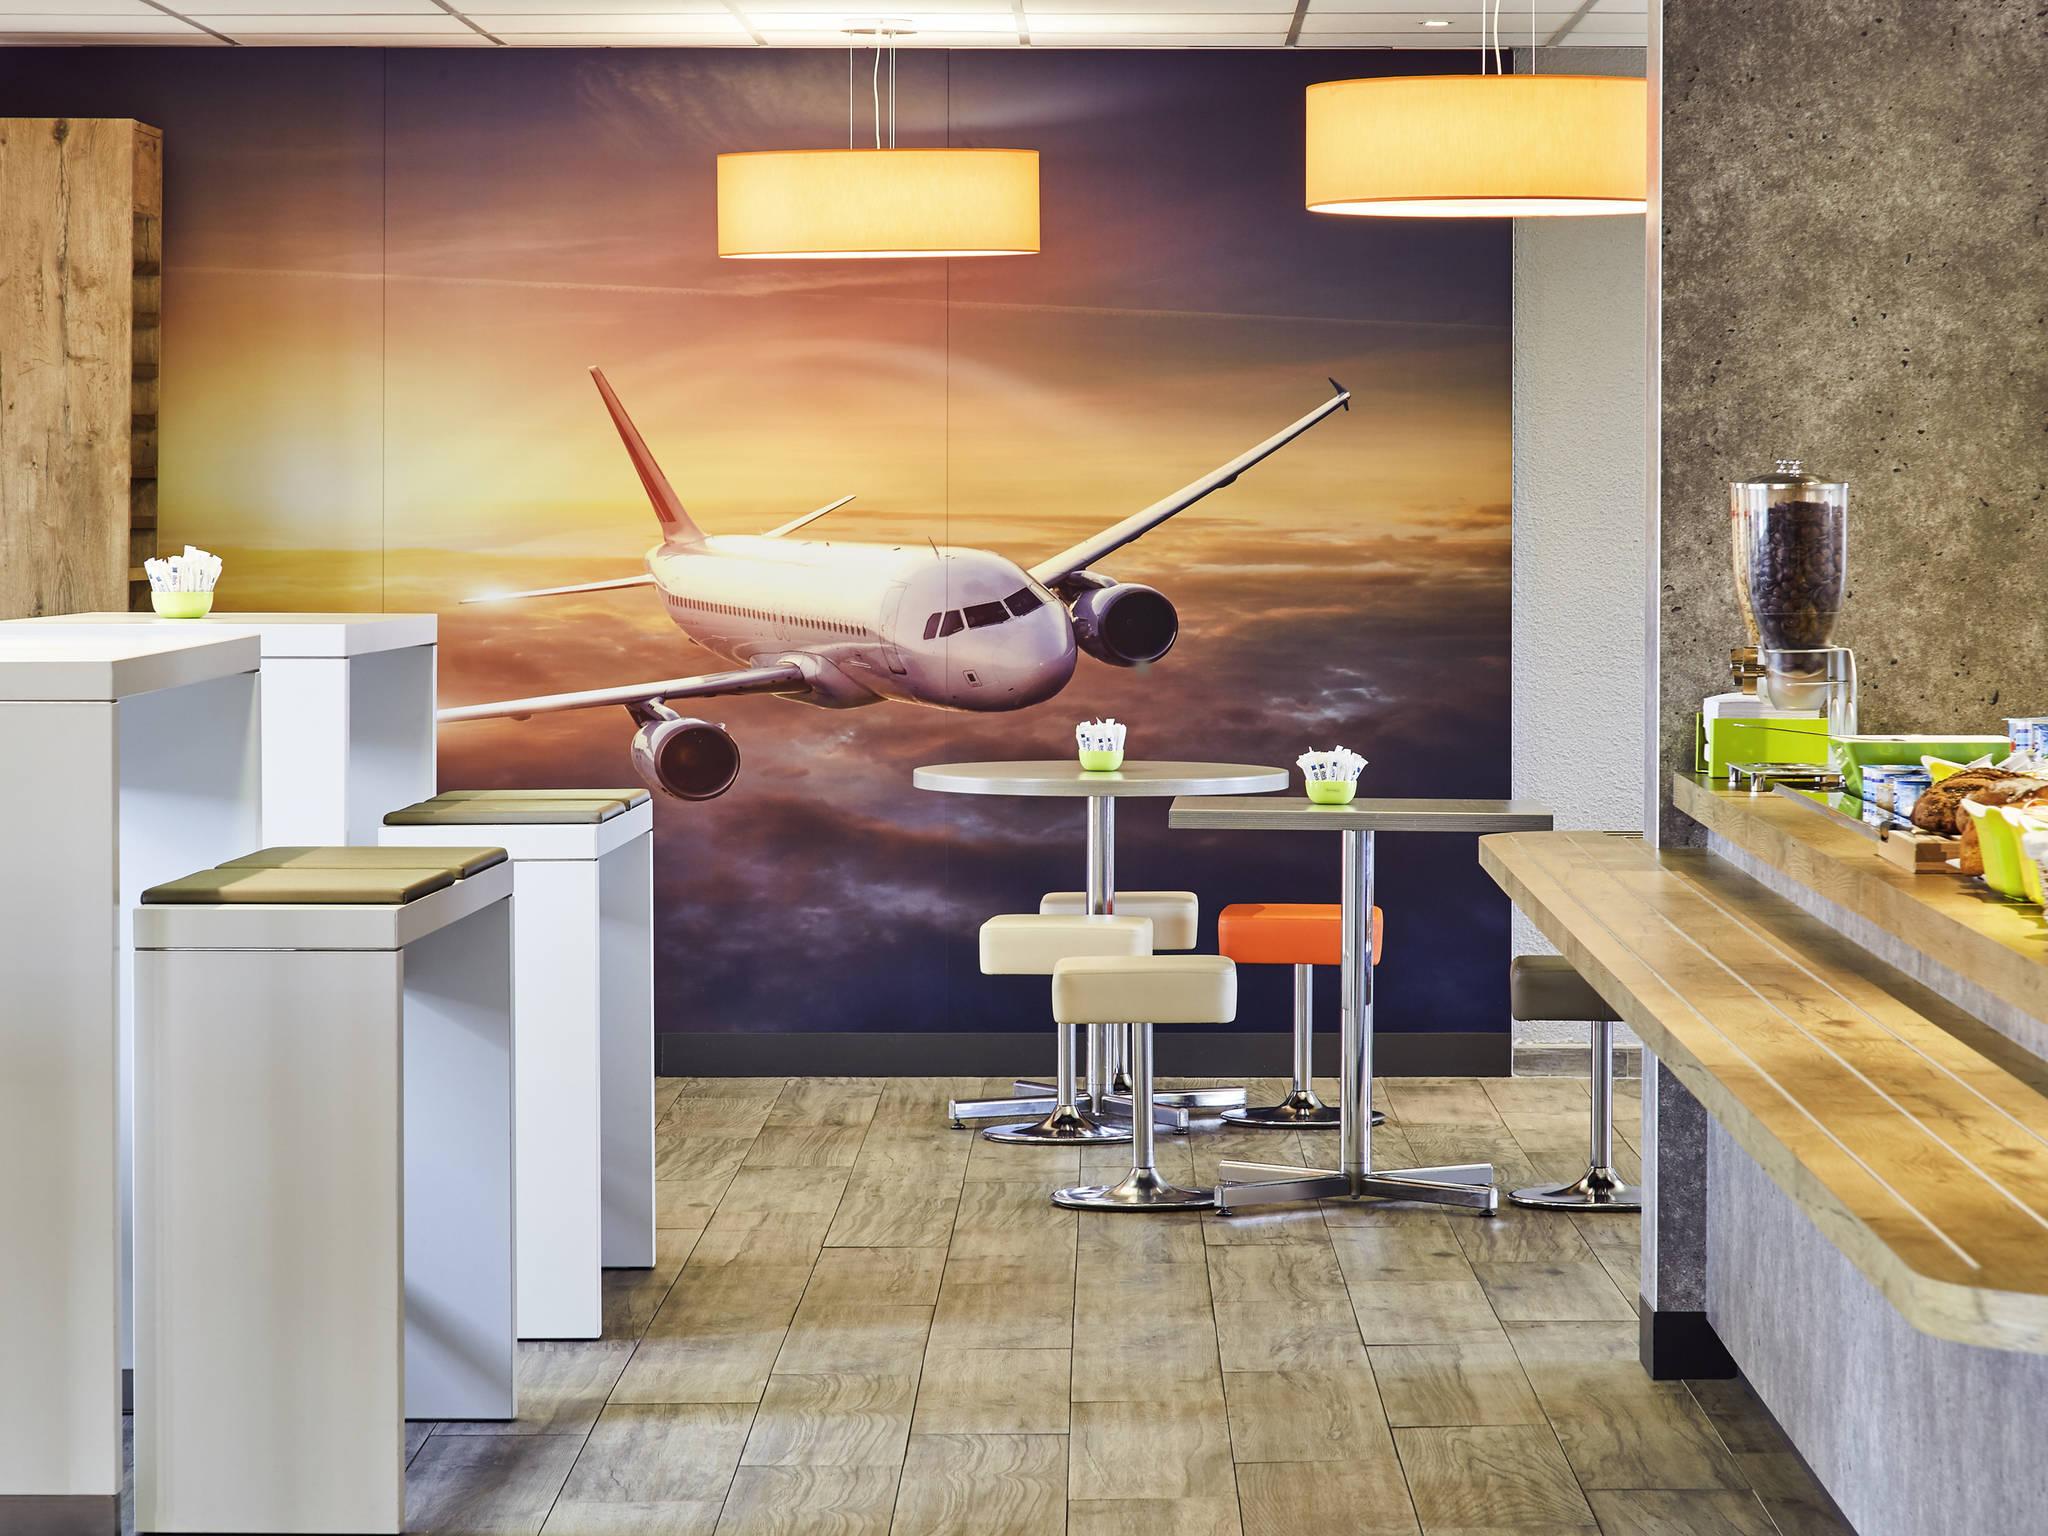 hotel in marignane ibis budget airport marseille provence. Black Bedroom Furniture Sets. Home Design Ideas